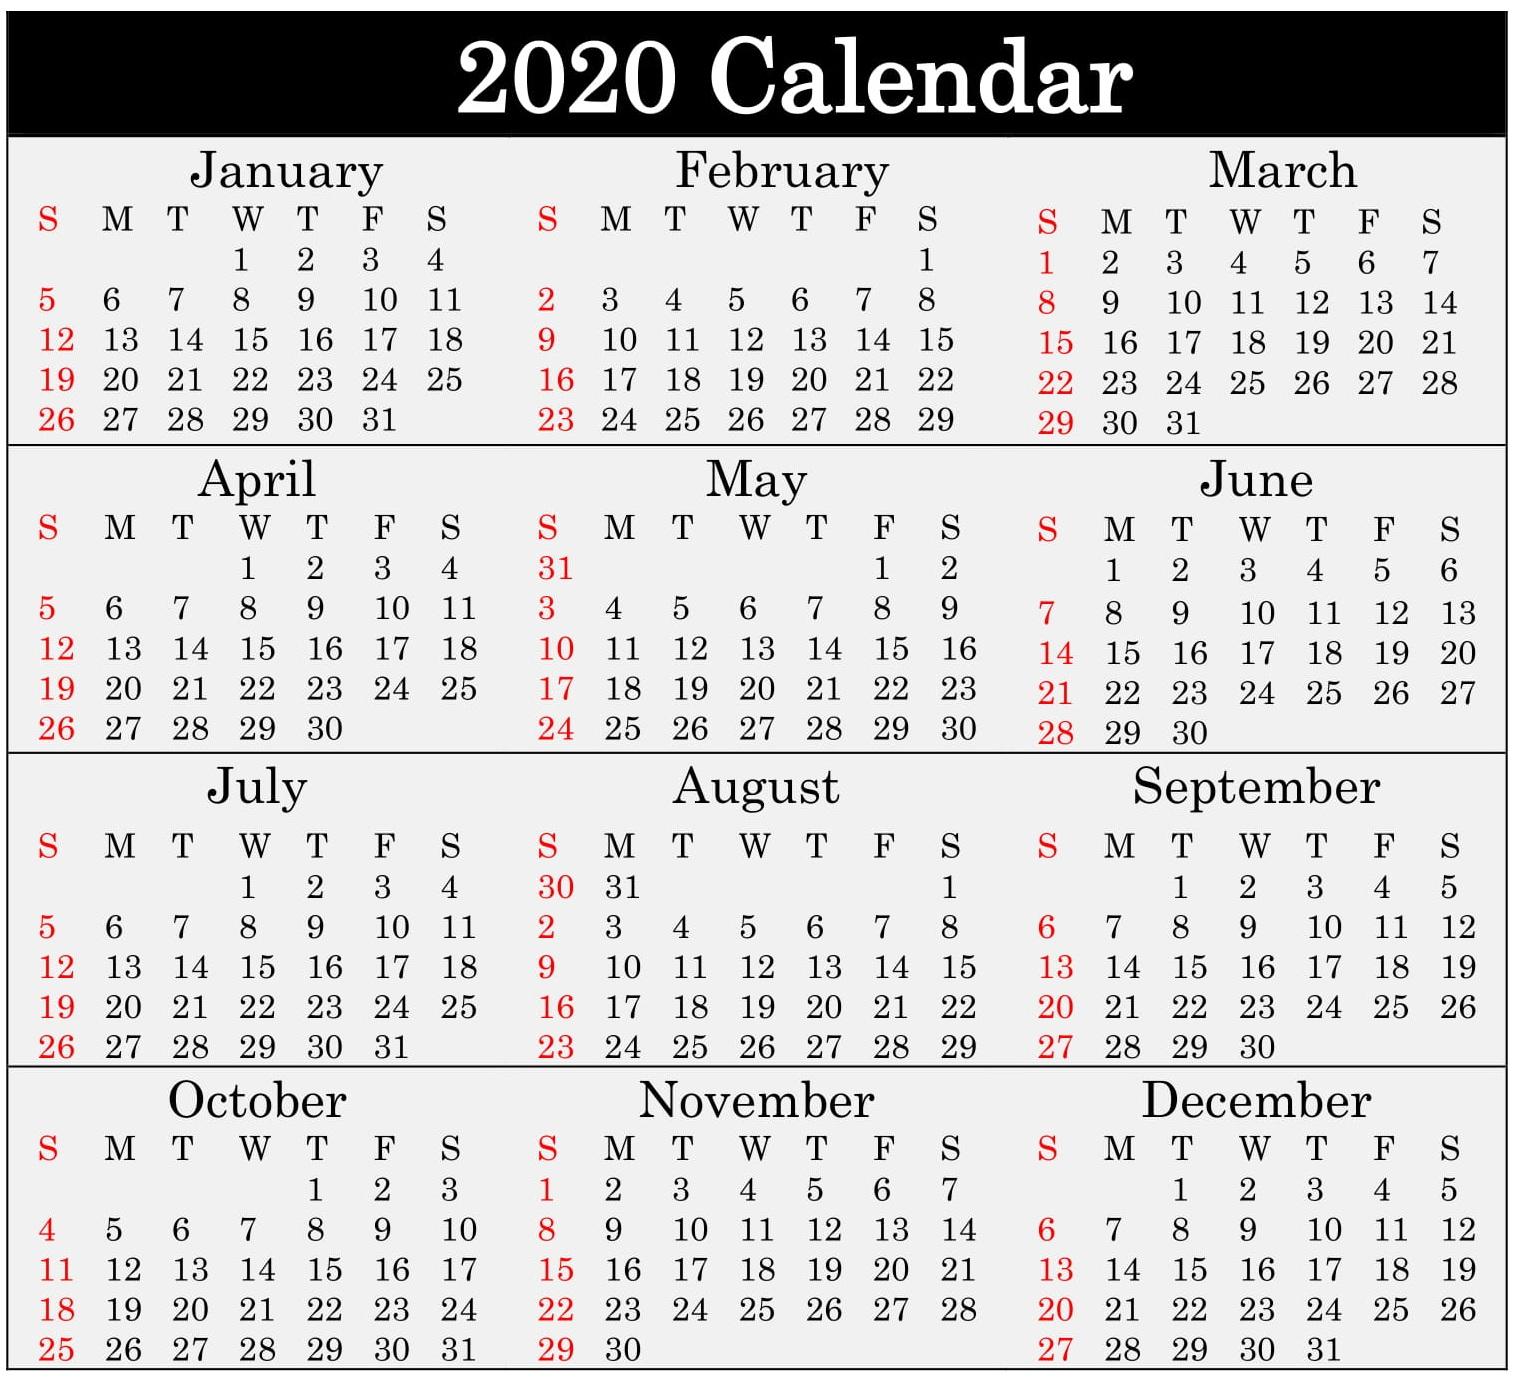 Free Printable 2020 Calendar Word, Pdf, Excel Document regarding Add Seasons To Google Calendar